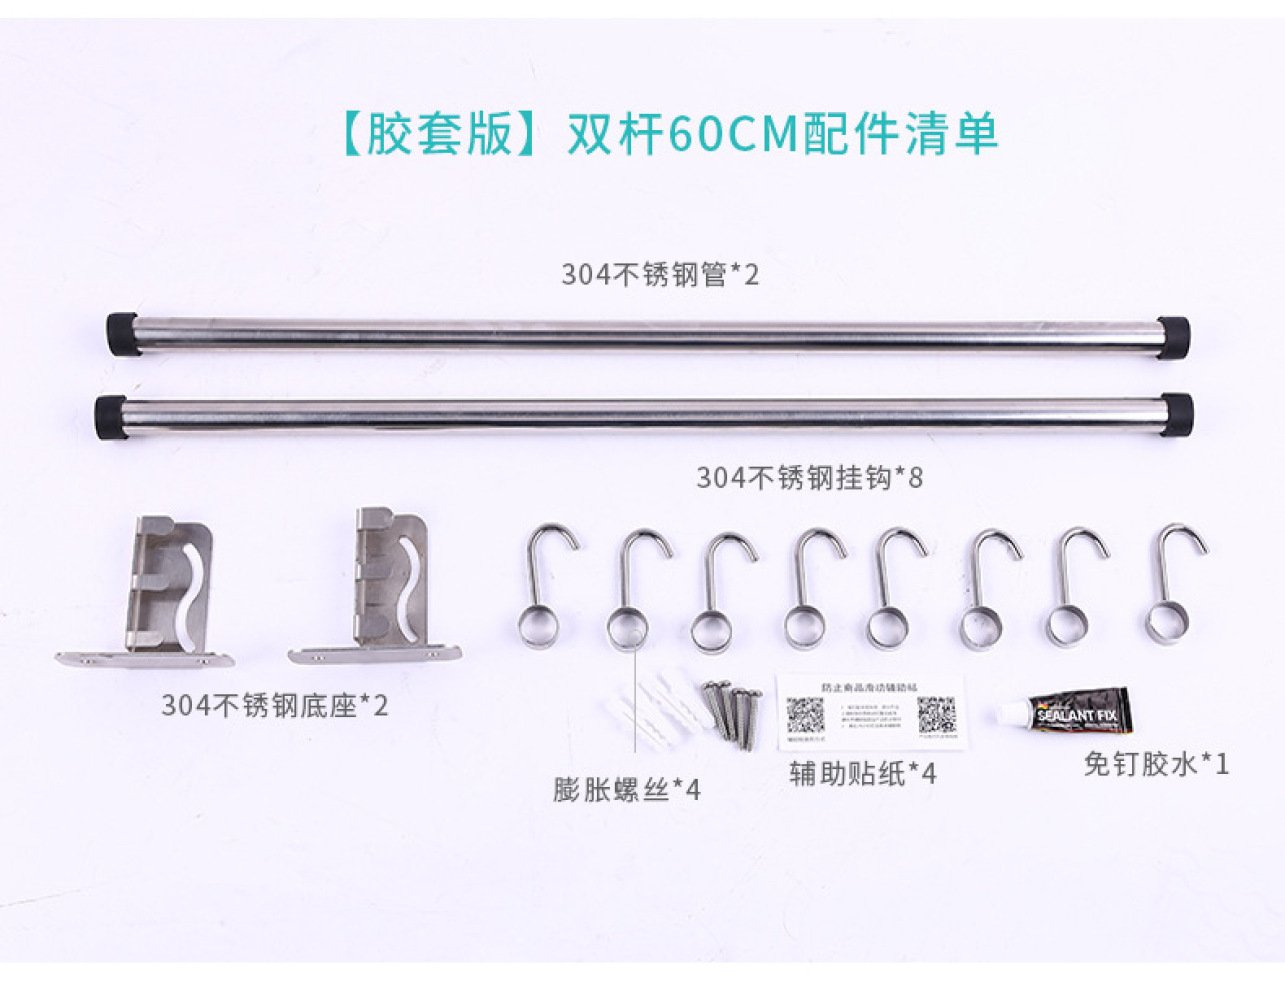 CFJ 304 Stainless Steel Free Punching Slot Rack Wall Mount Kitchen Multifunctional Knife Holder Chopsticks Tube lid Rack Storage,Silver,One Size